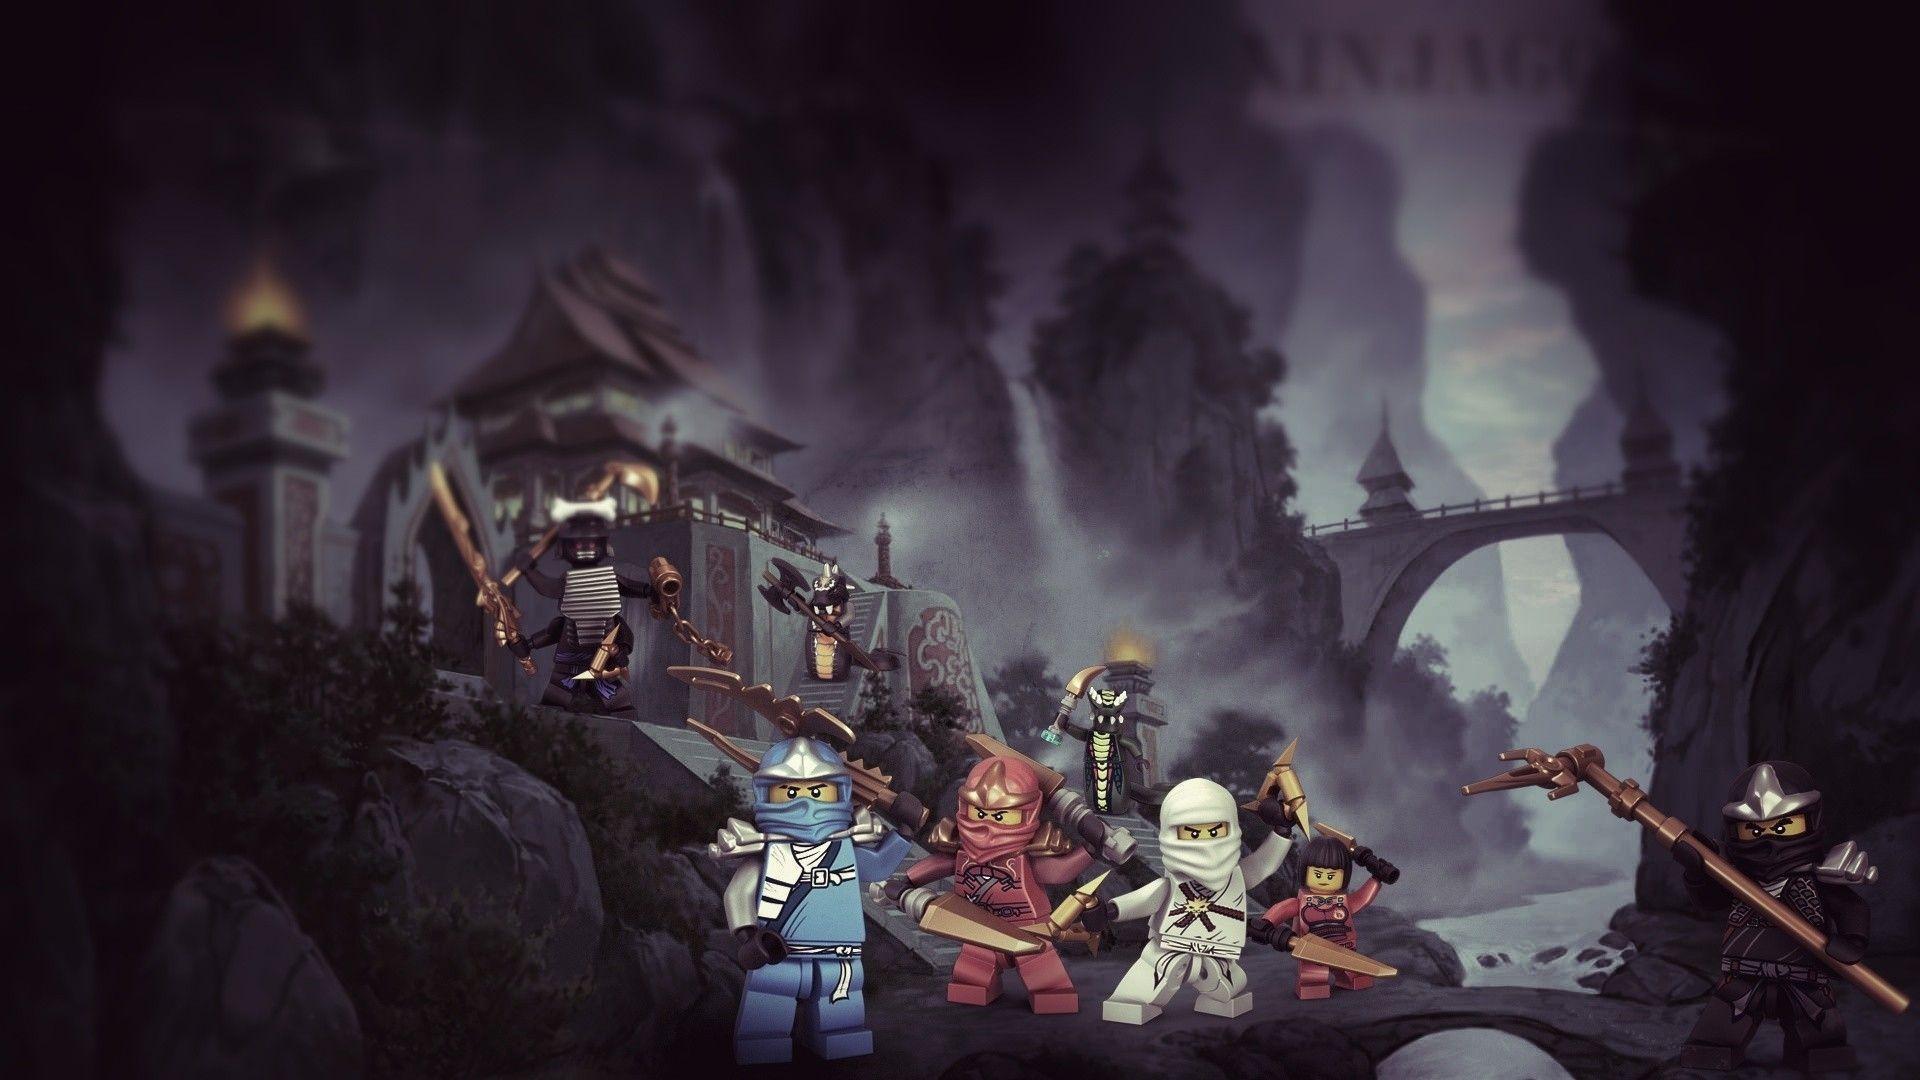 Ninjago Wallpapers Wallpaper Cave HD Wallpapers Download Free Images Wallpaper [1000image.com]